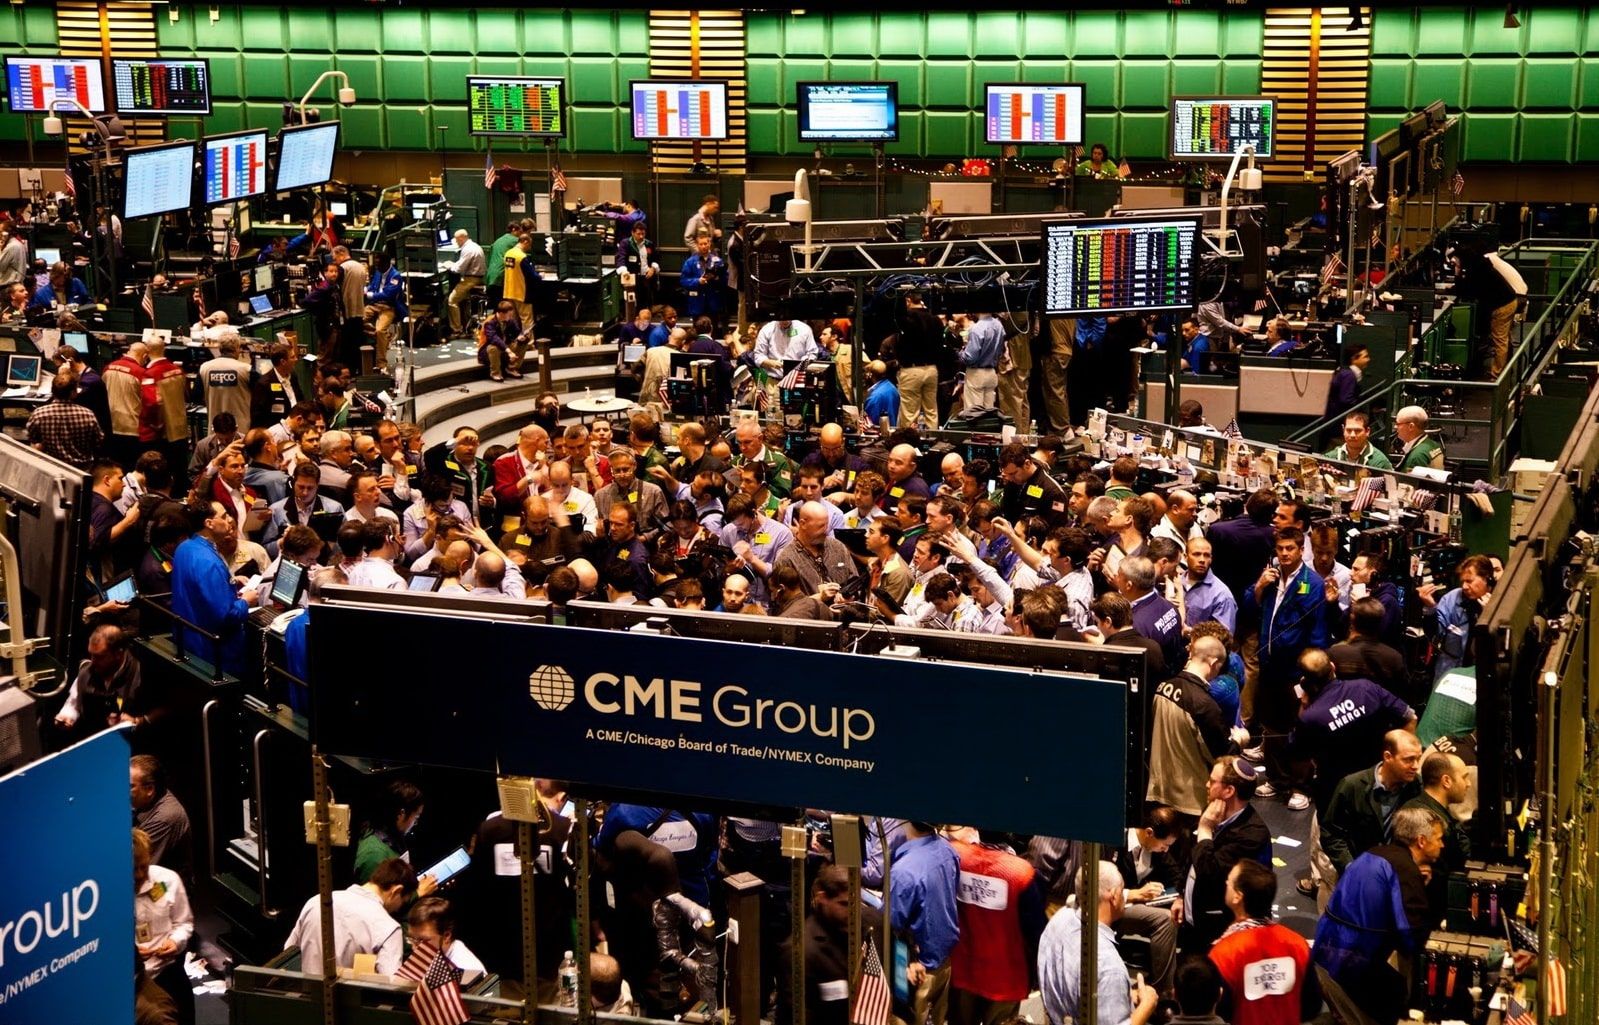 cme чикагская товарная биржа